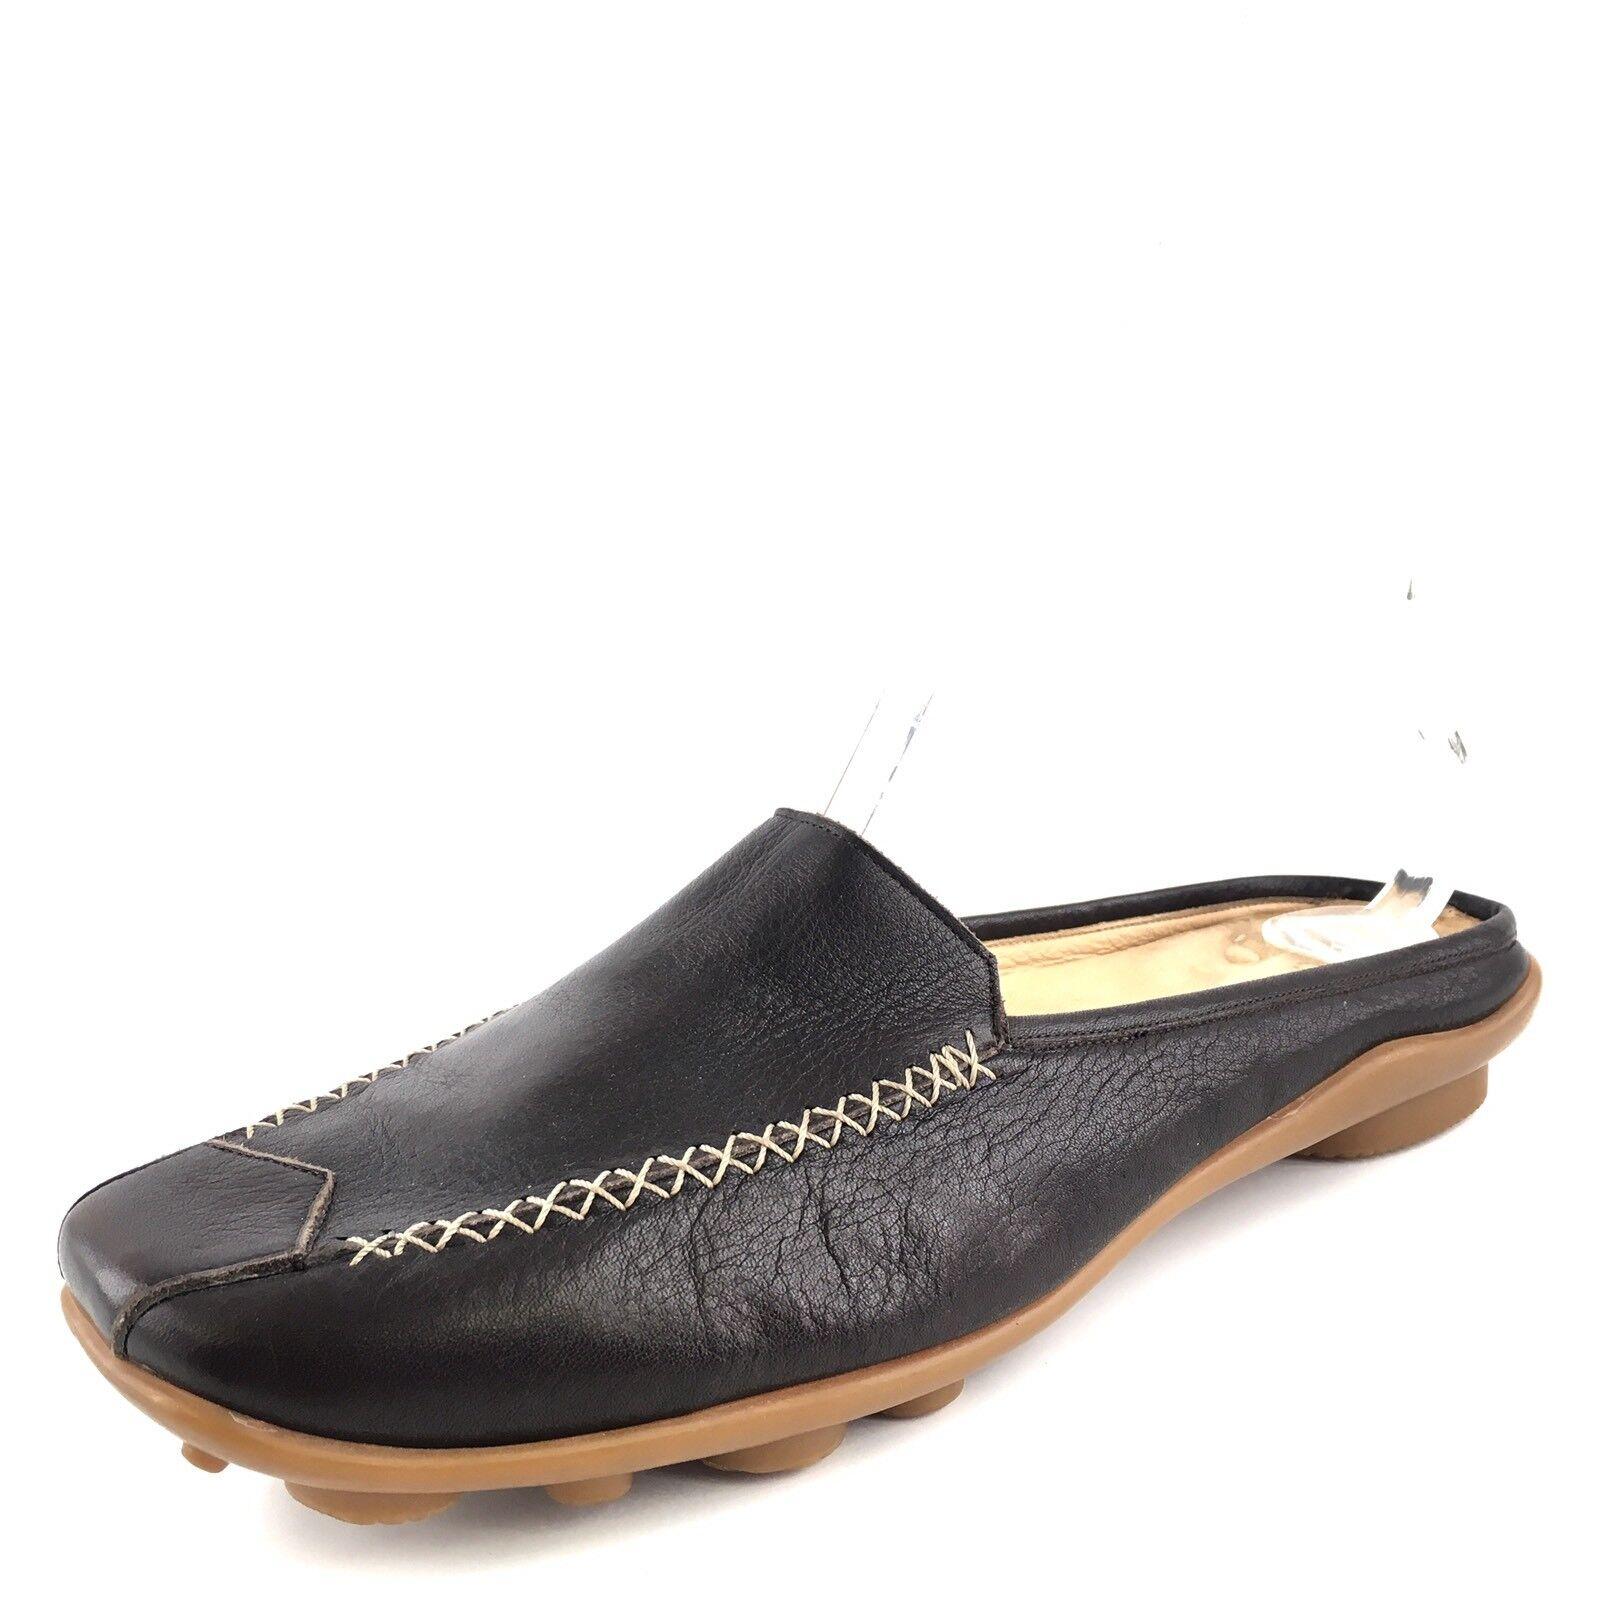 Gentle Souls Iso Black Leather Comfort Mules Slides Women's Size 41 M